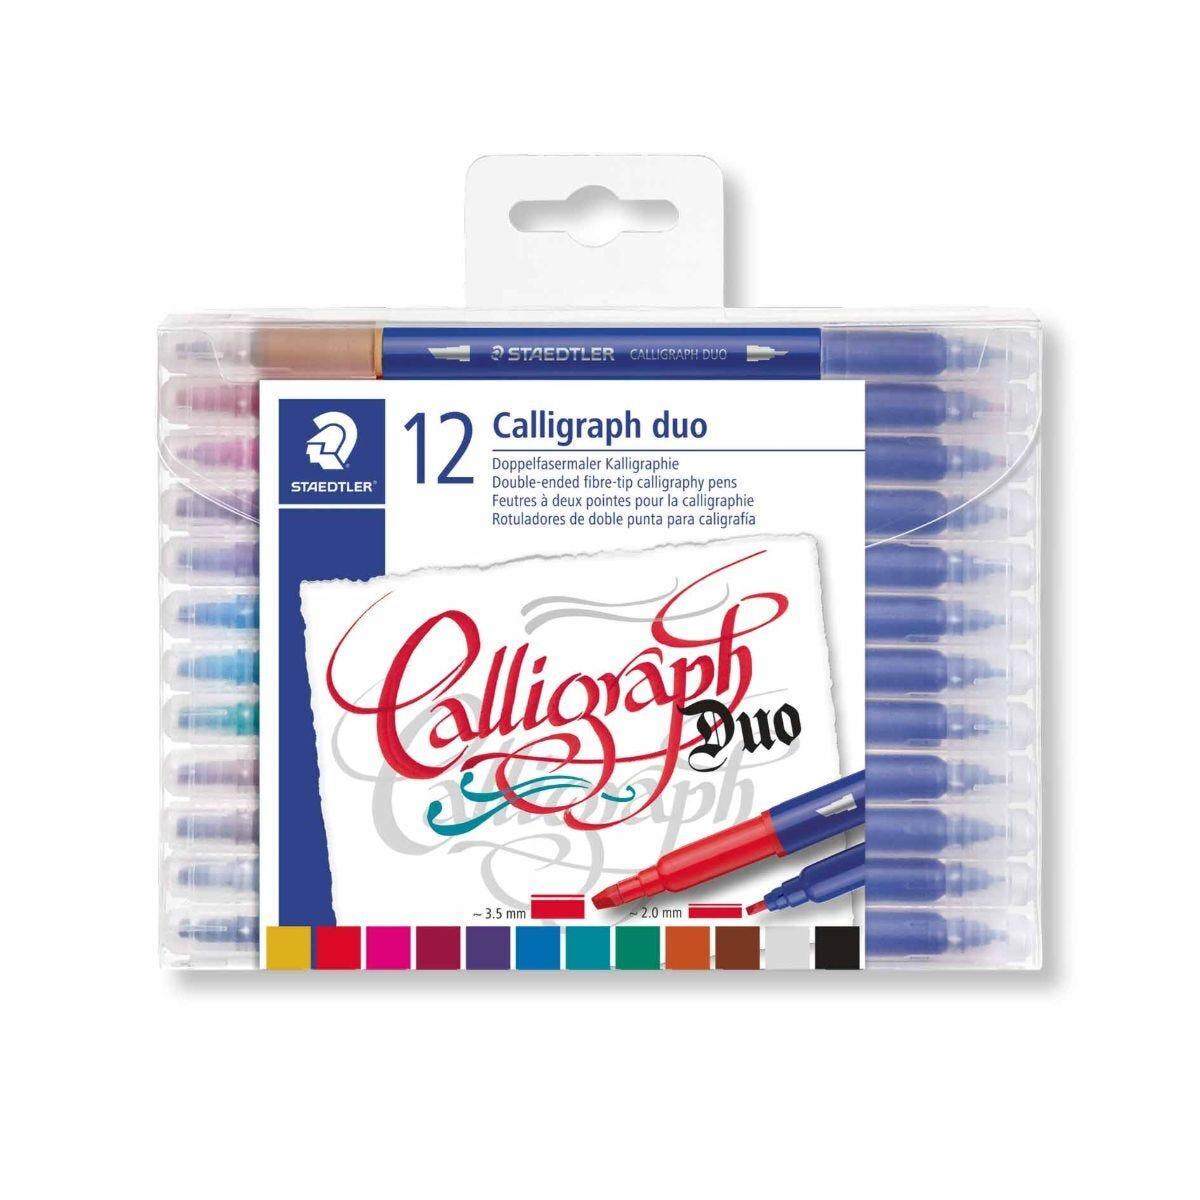 Staedtler Calligraphy Duo Tip Pens Pack of 12